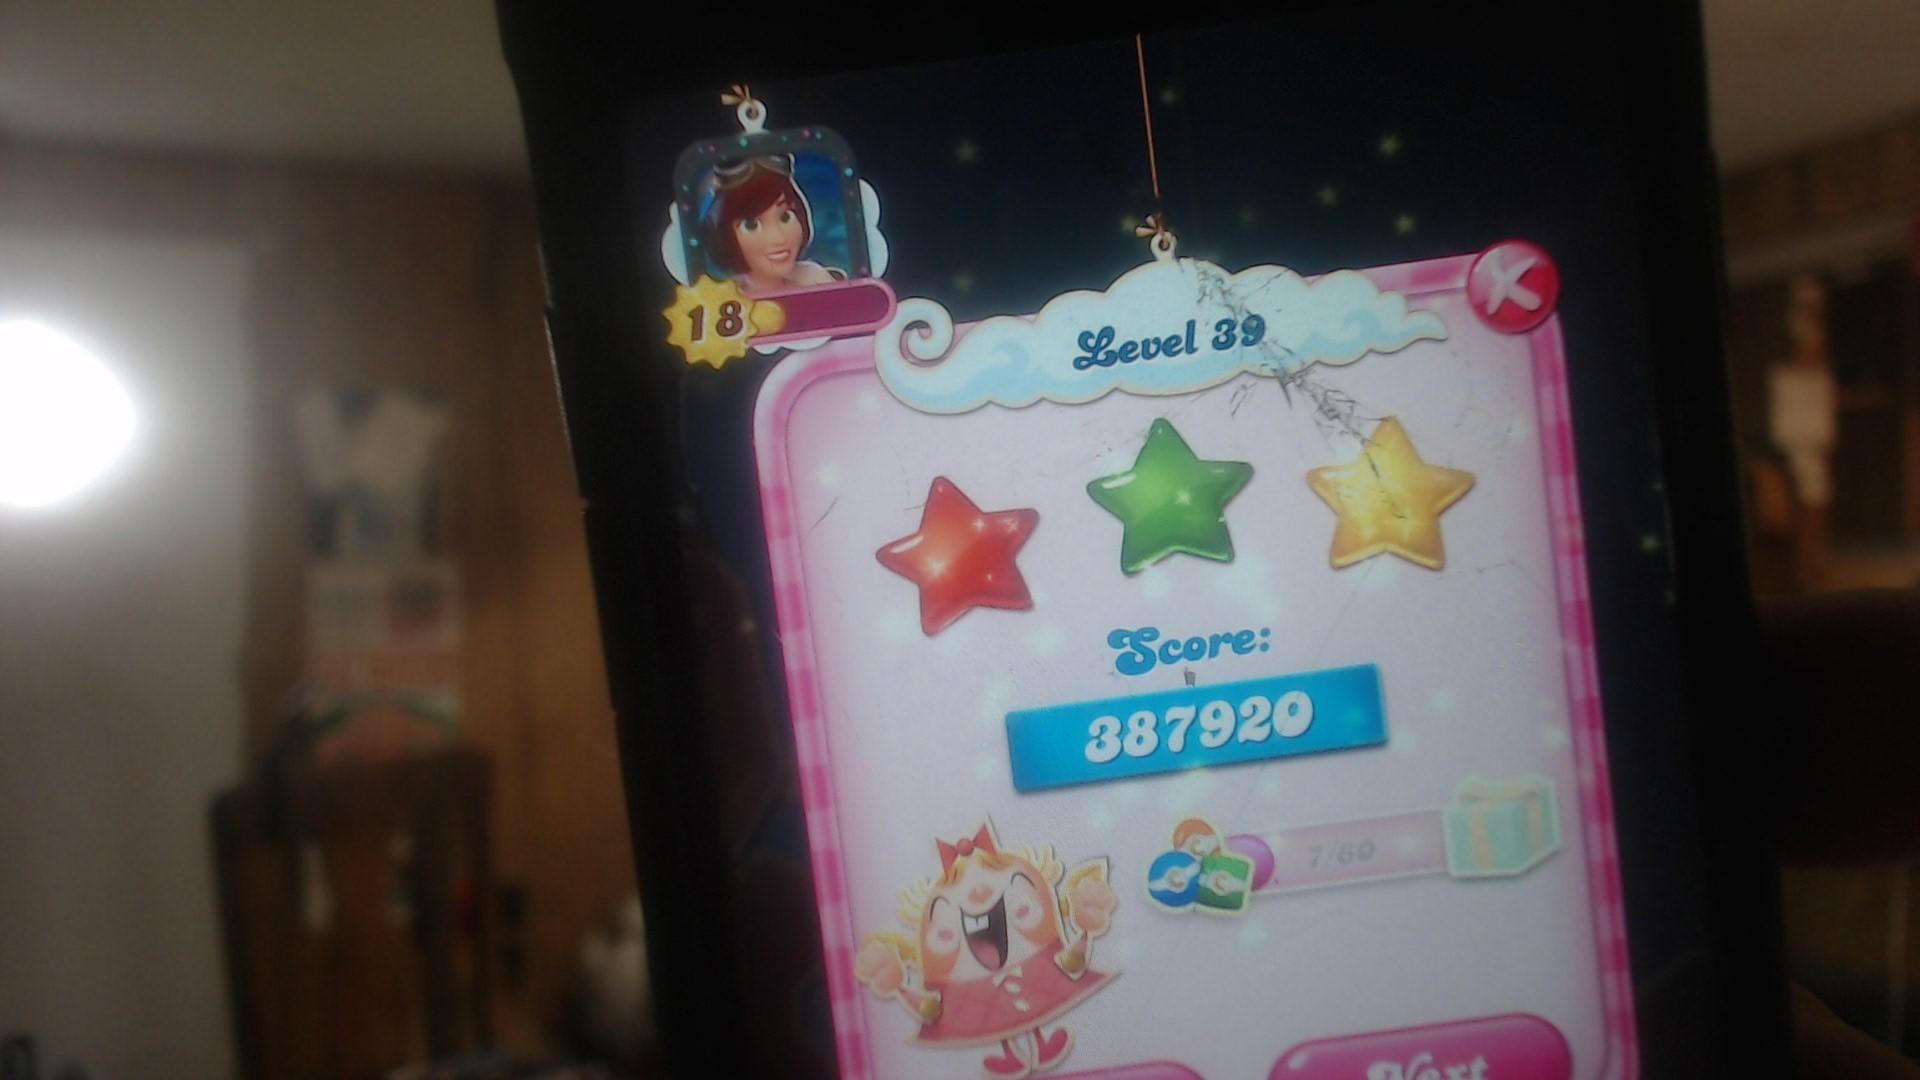 speedy4759123: Candy Crush Saga: Level 039 (iOS) 387,920 points on 2019-07-17 10:57:23